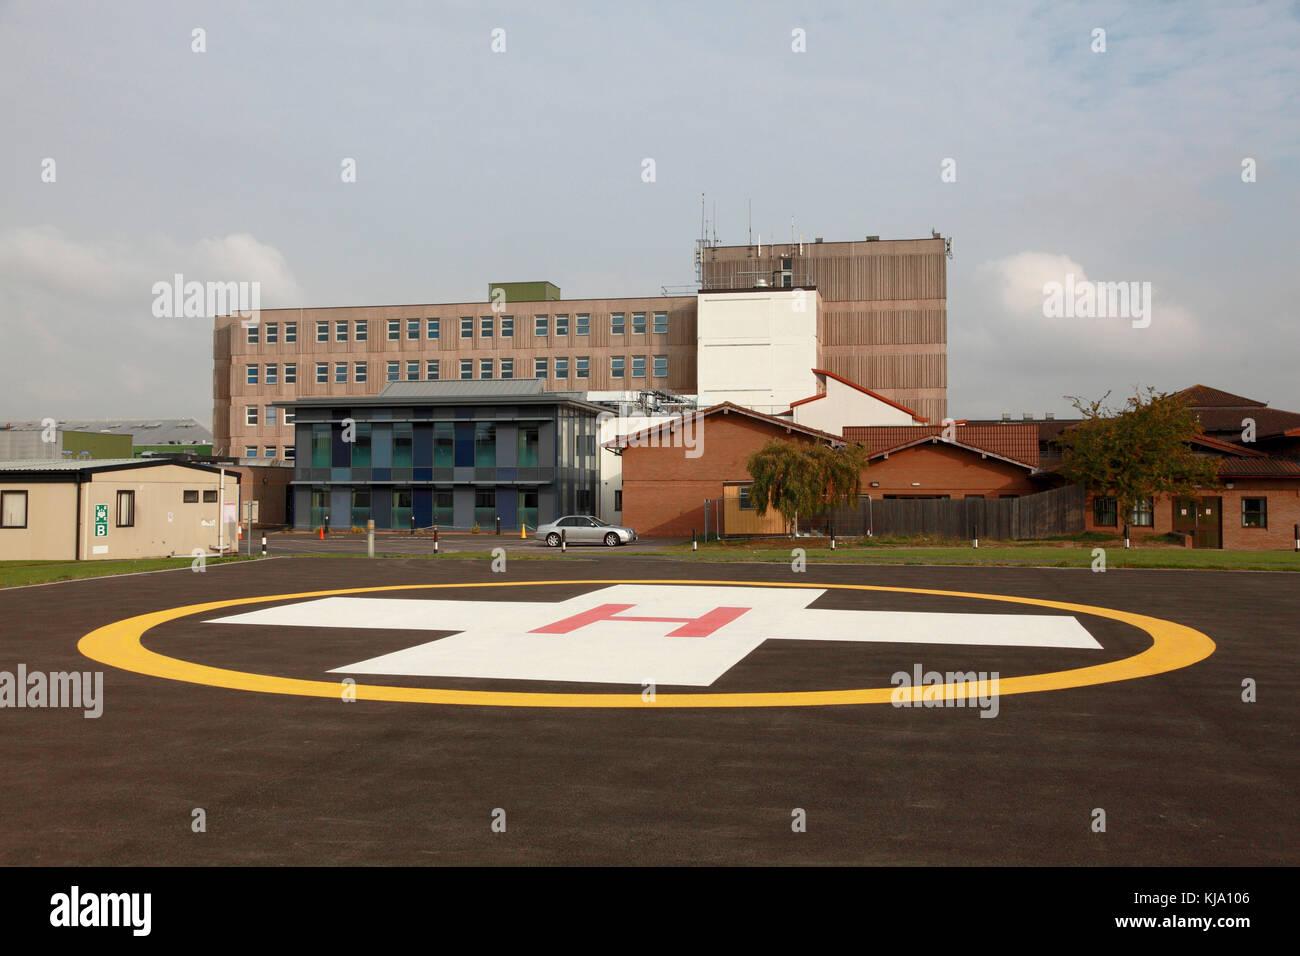 The helipad at the NHS Royal Shrewsbury Hospital, a teaching hospital - Stock Image